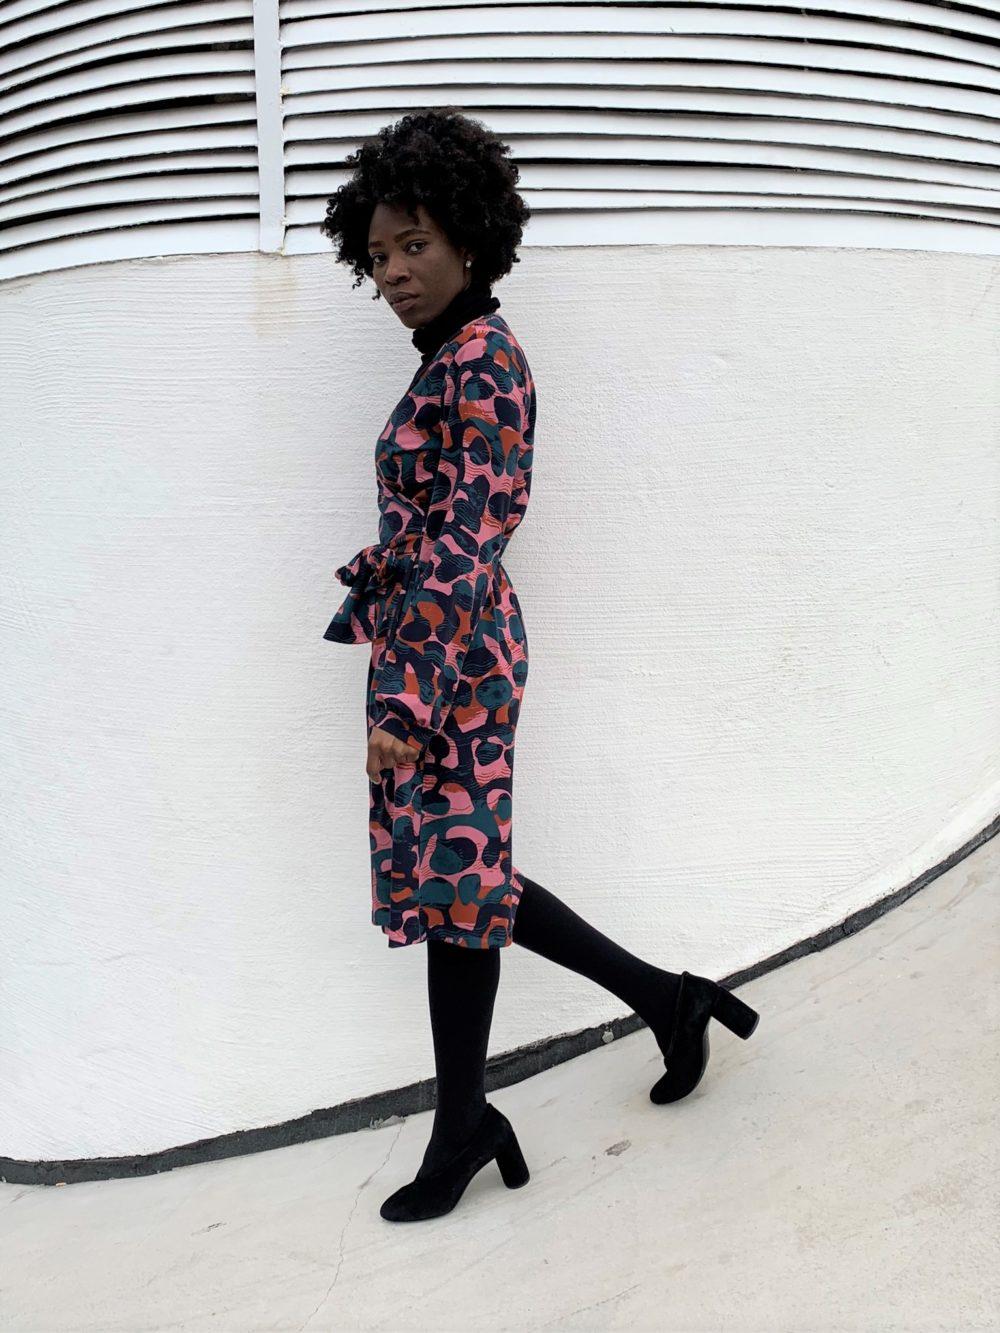 Vimma Ruffle Dress IRINA black Onesize - black, IRINA, Onesize, Ruffle Dress